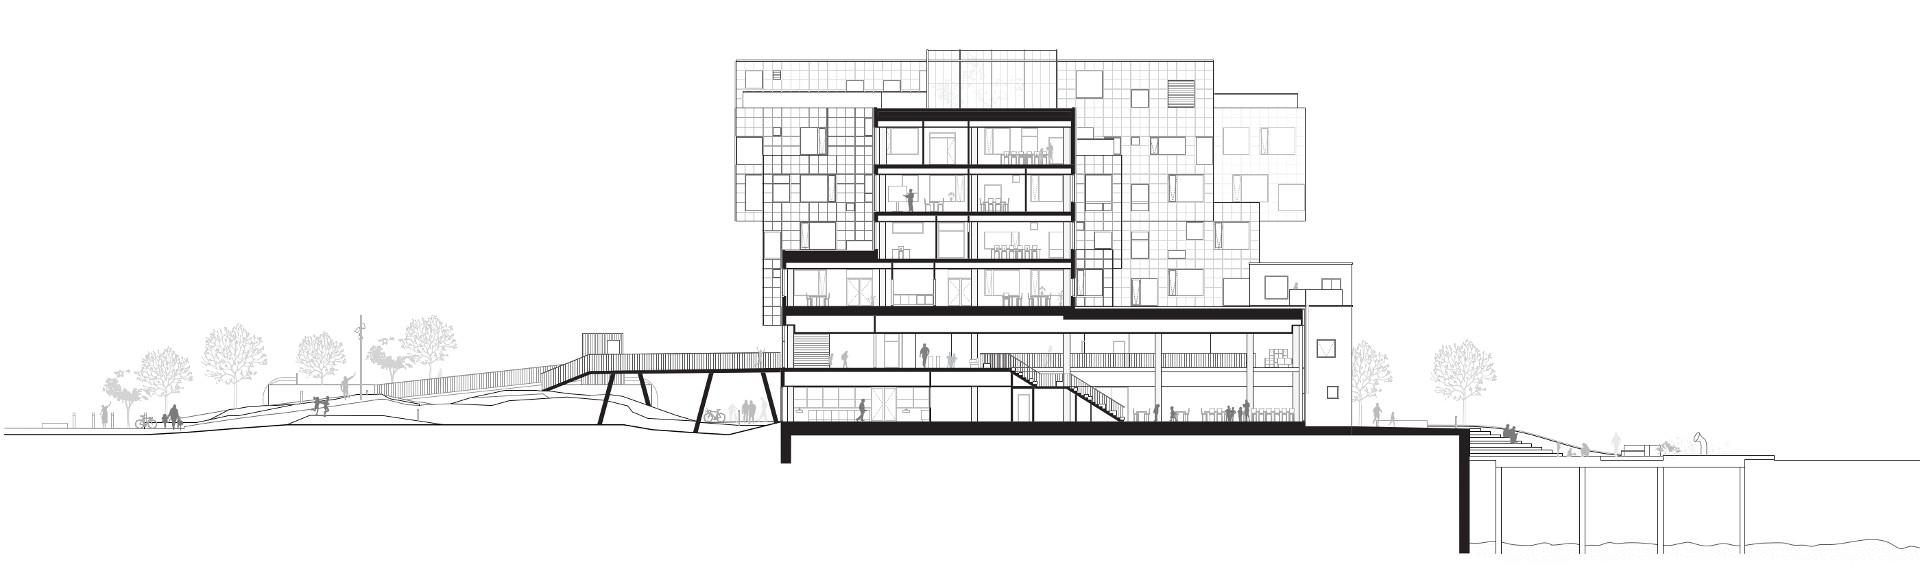 Copenhagen International School with solar panels by C.F. Møller Architects